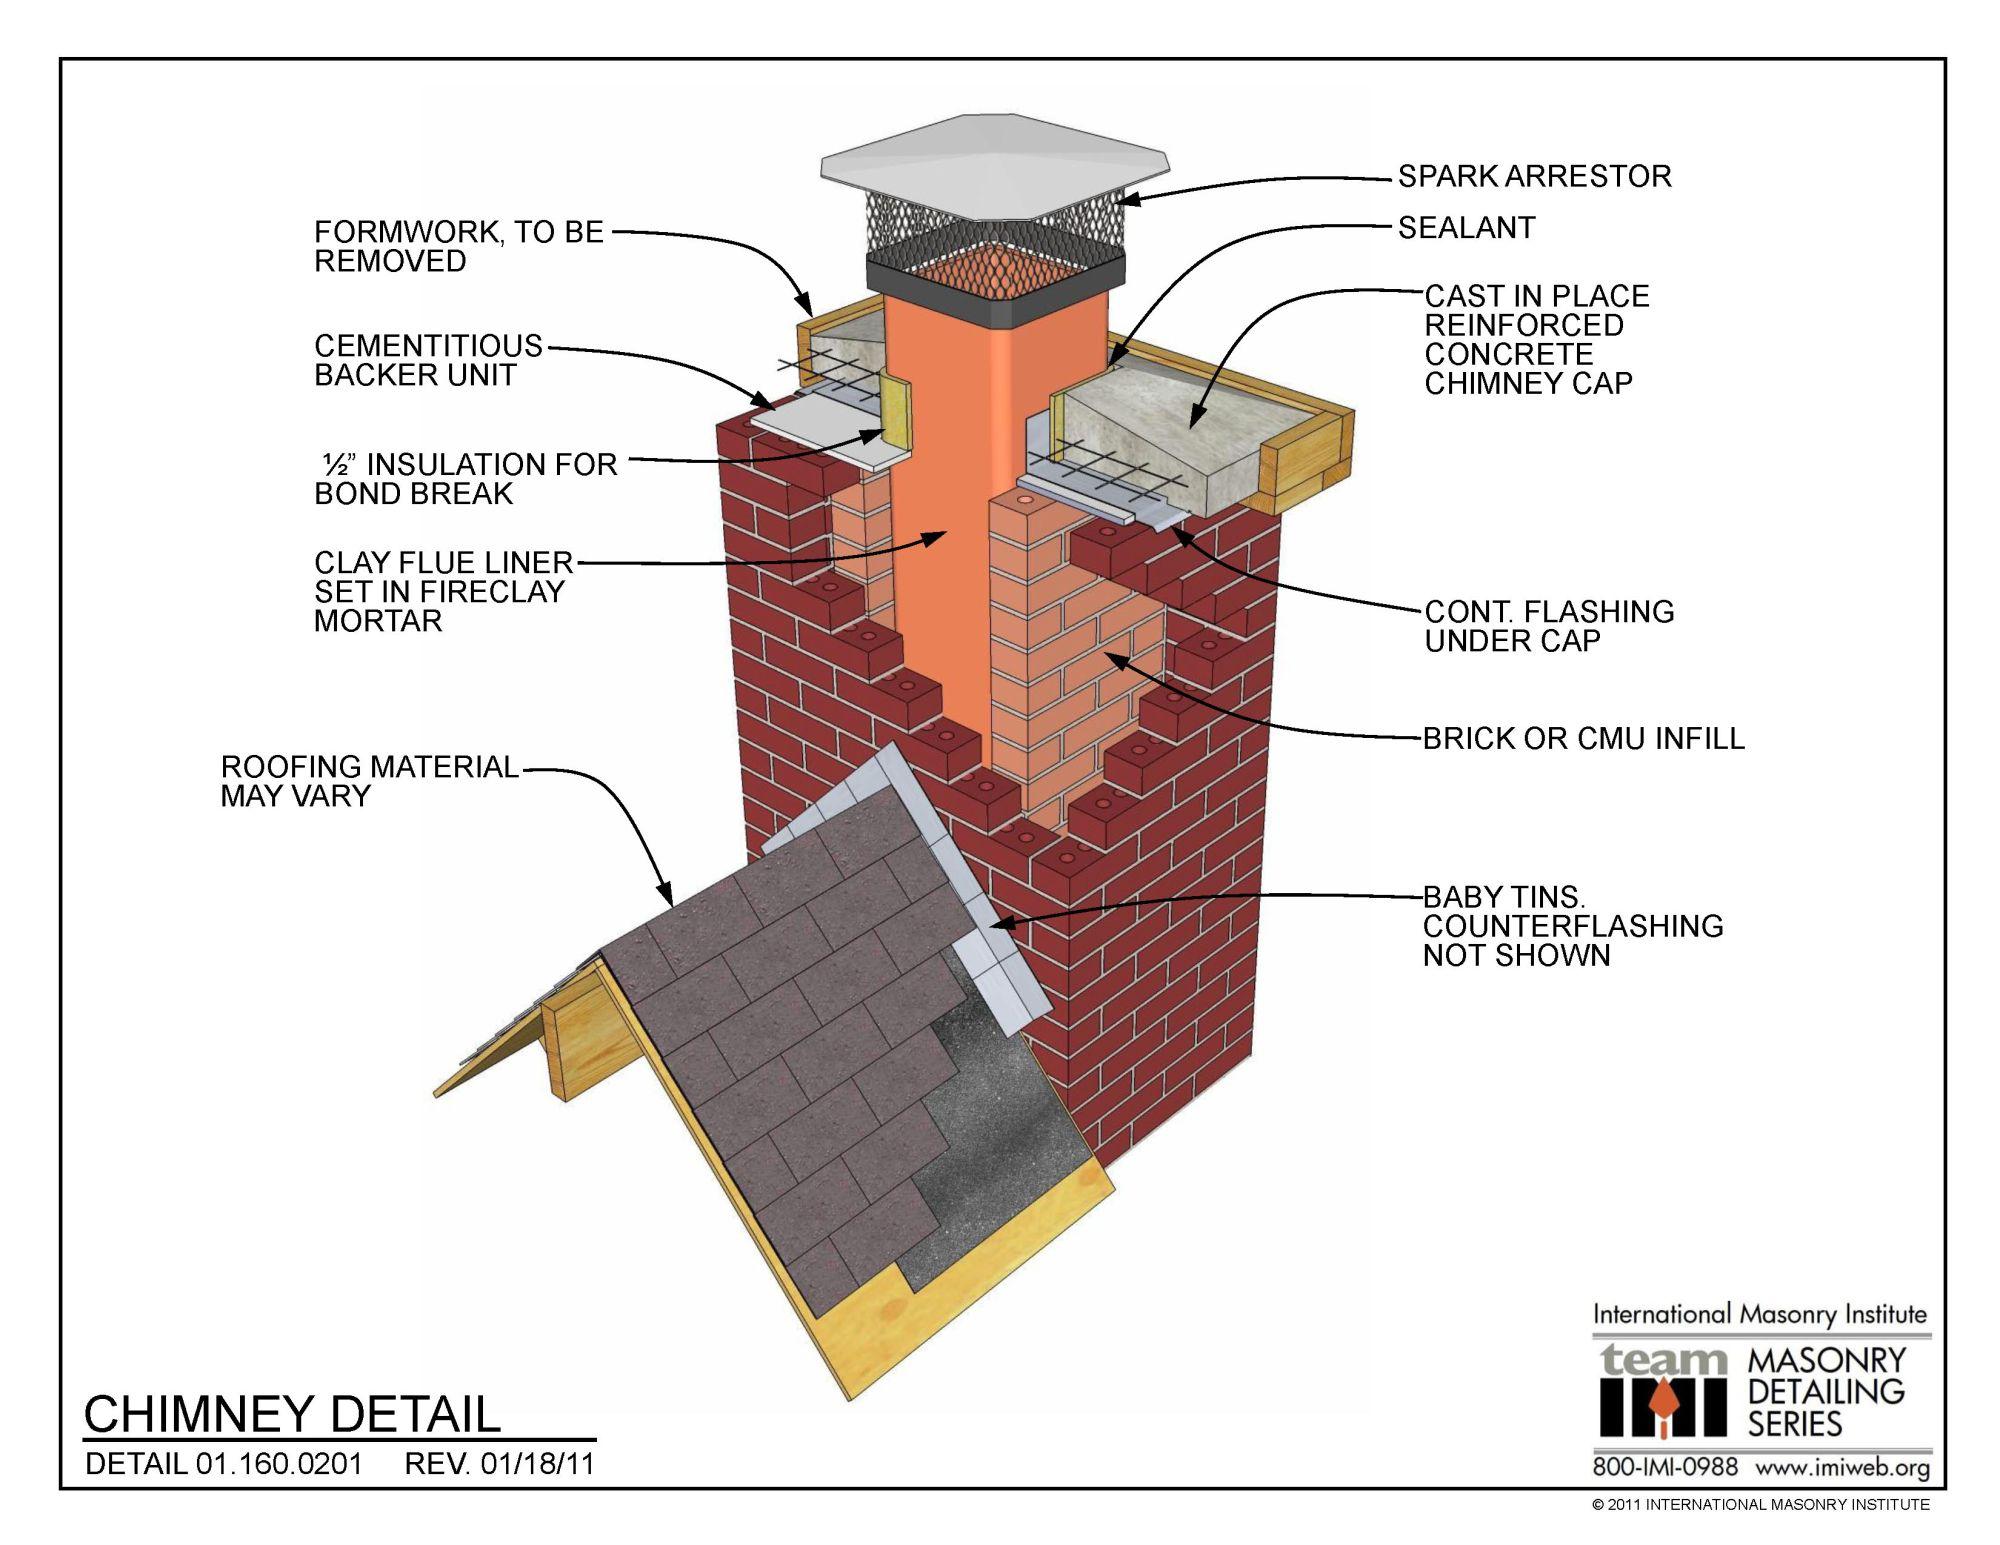 hight resolution of 01 160 0201 chimney detail international masonry institute diagram of chimney cap